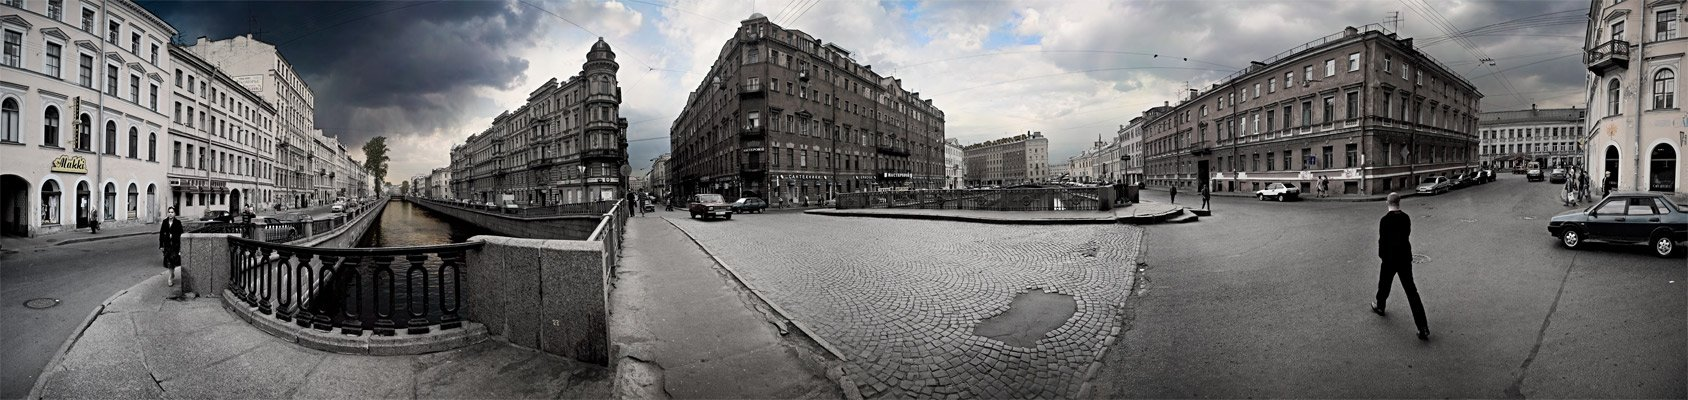 кокушкин, мост, санкт-петербург, Владимир Кириченко (vlkira)